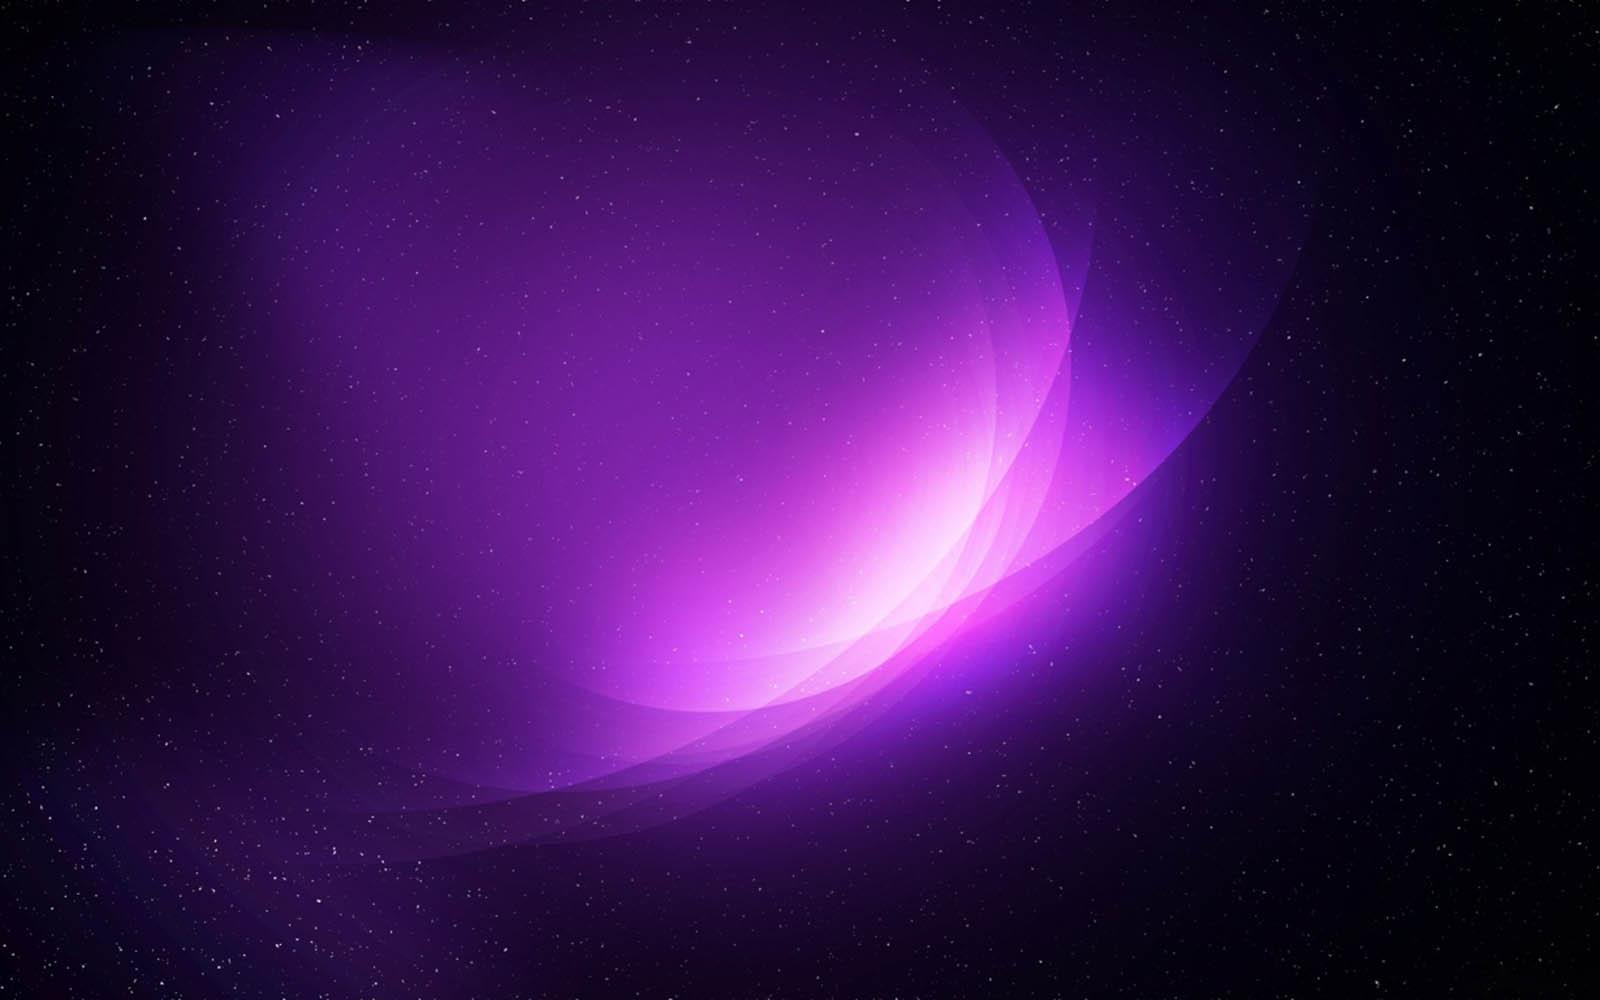 purple wallpaper 3 - photo #13